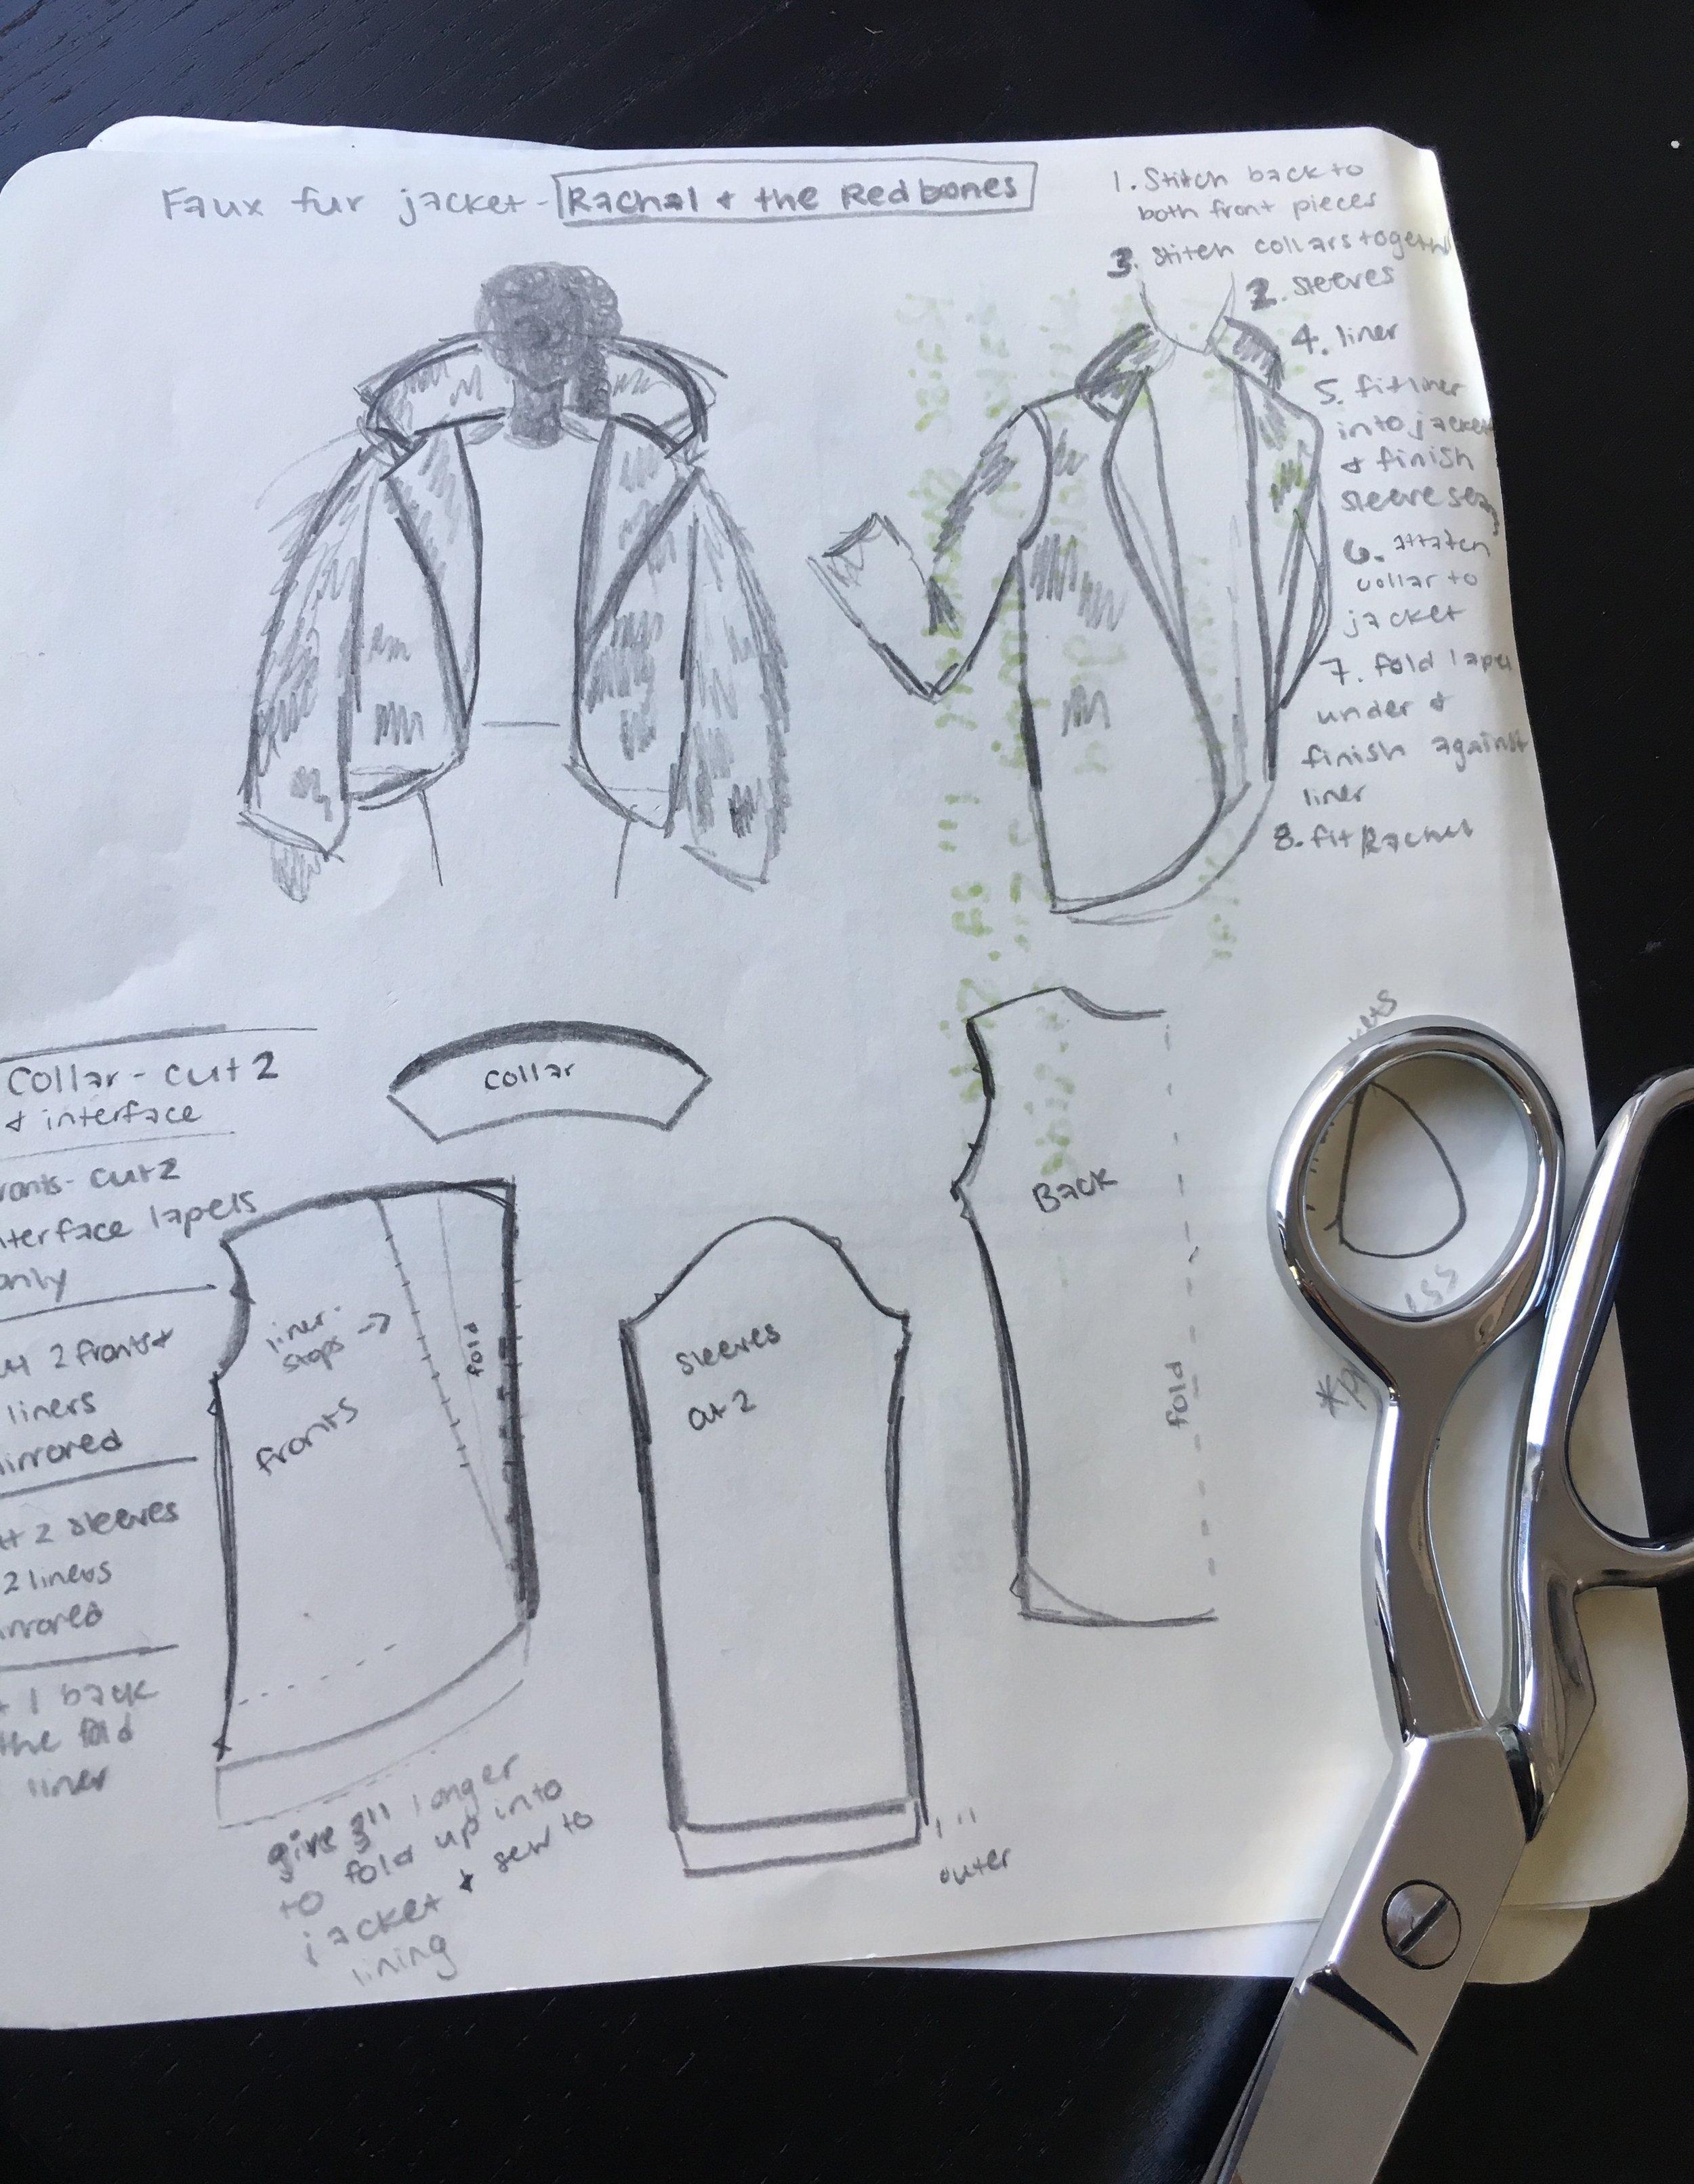 fur coat speck sheet.jpg